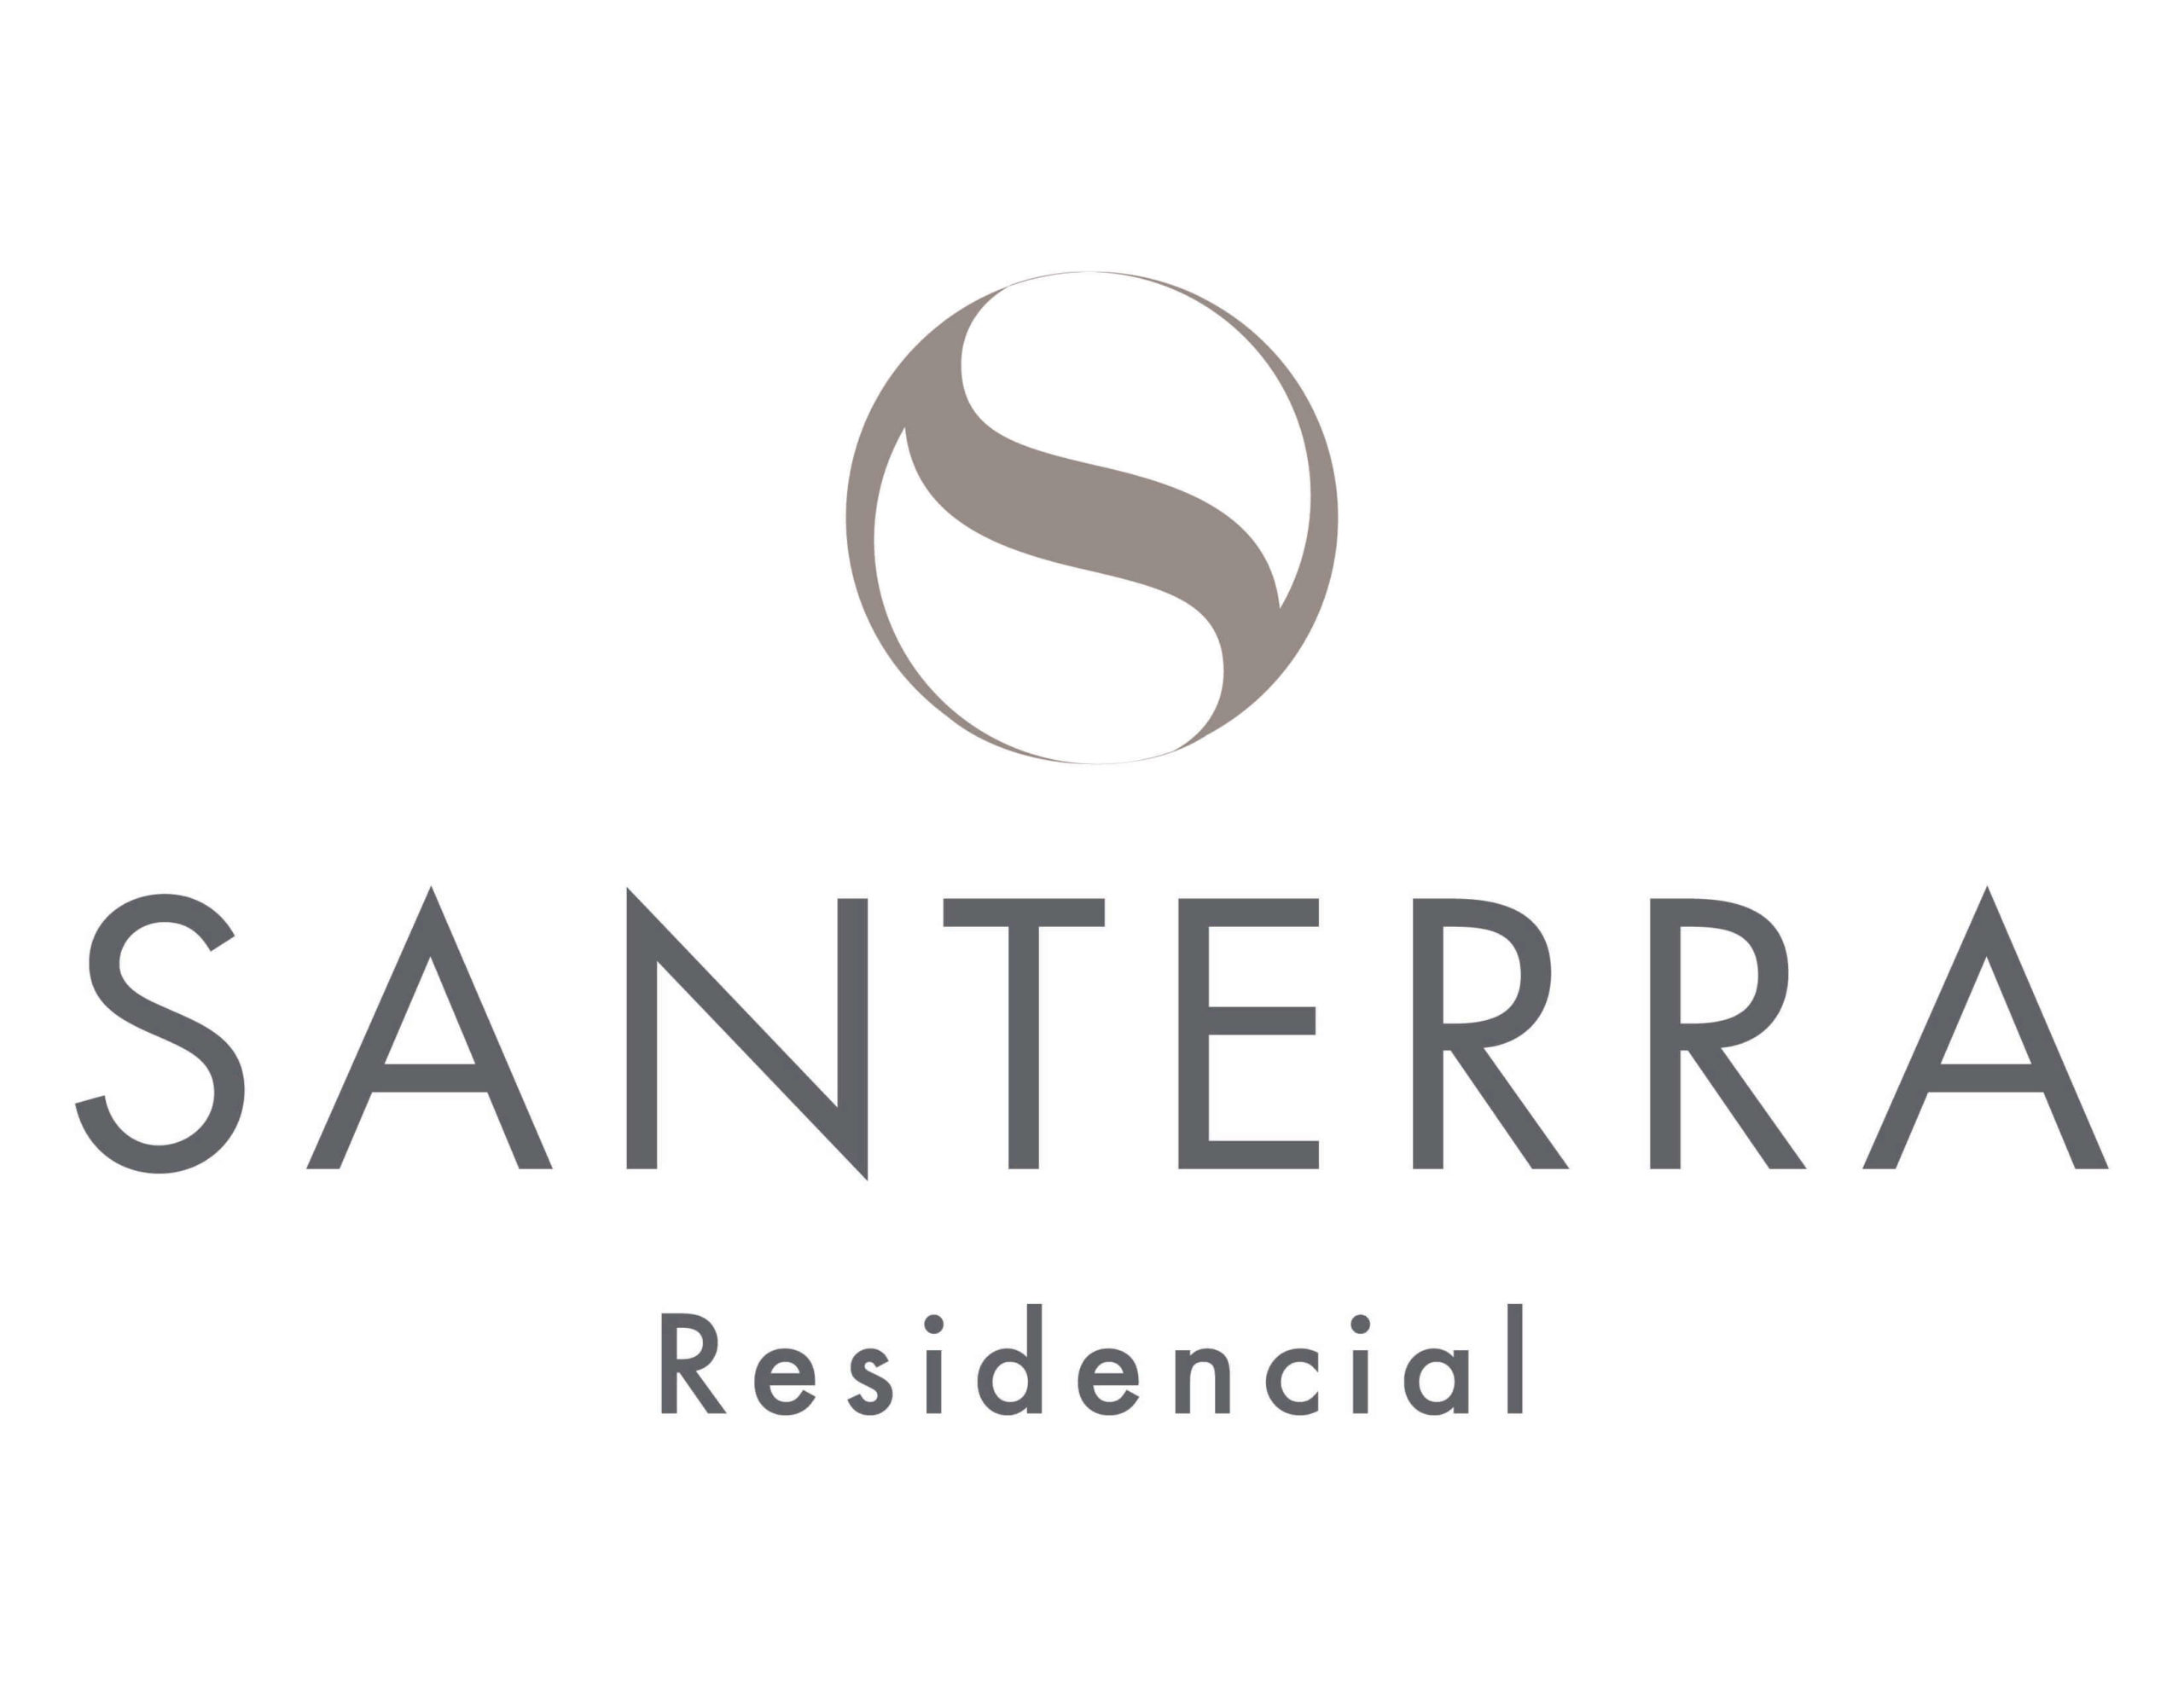 Santerra logo